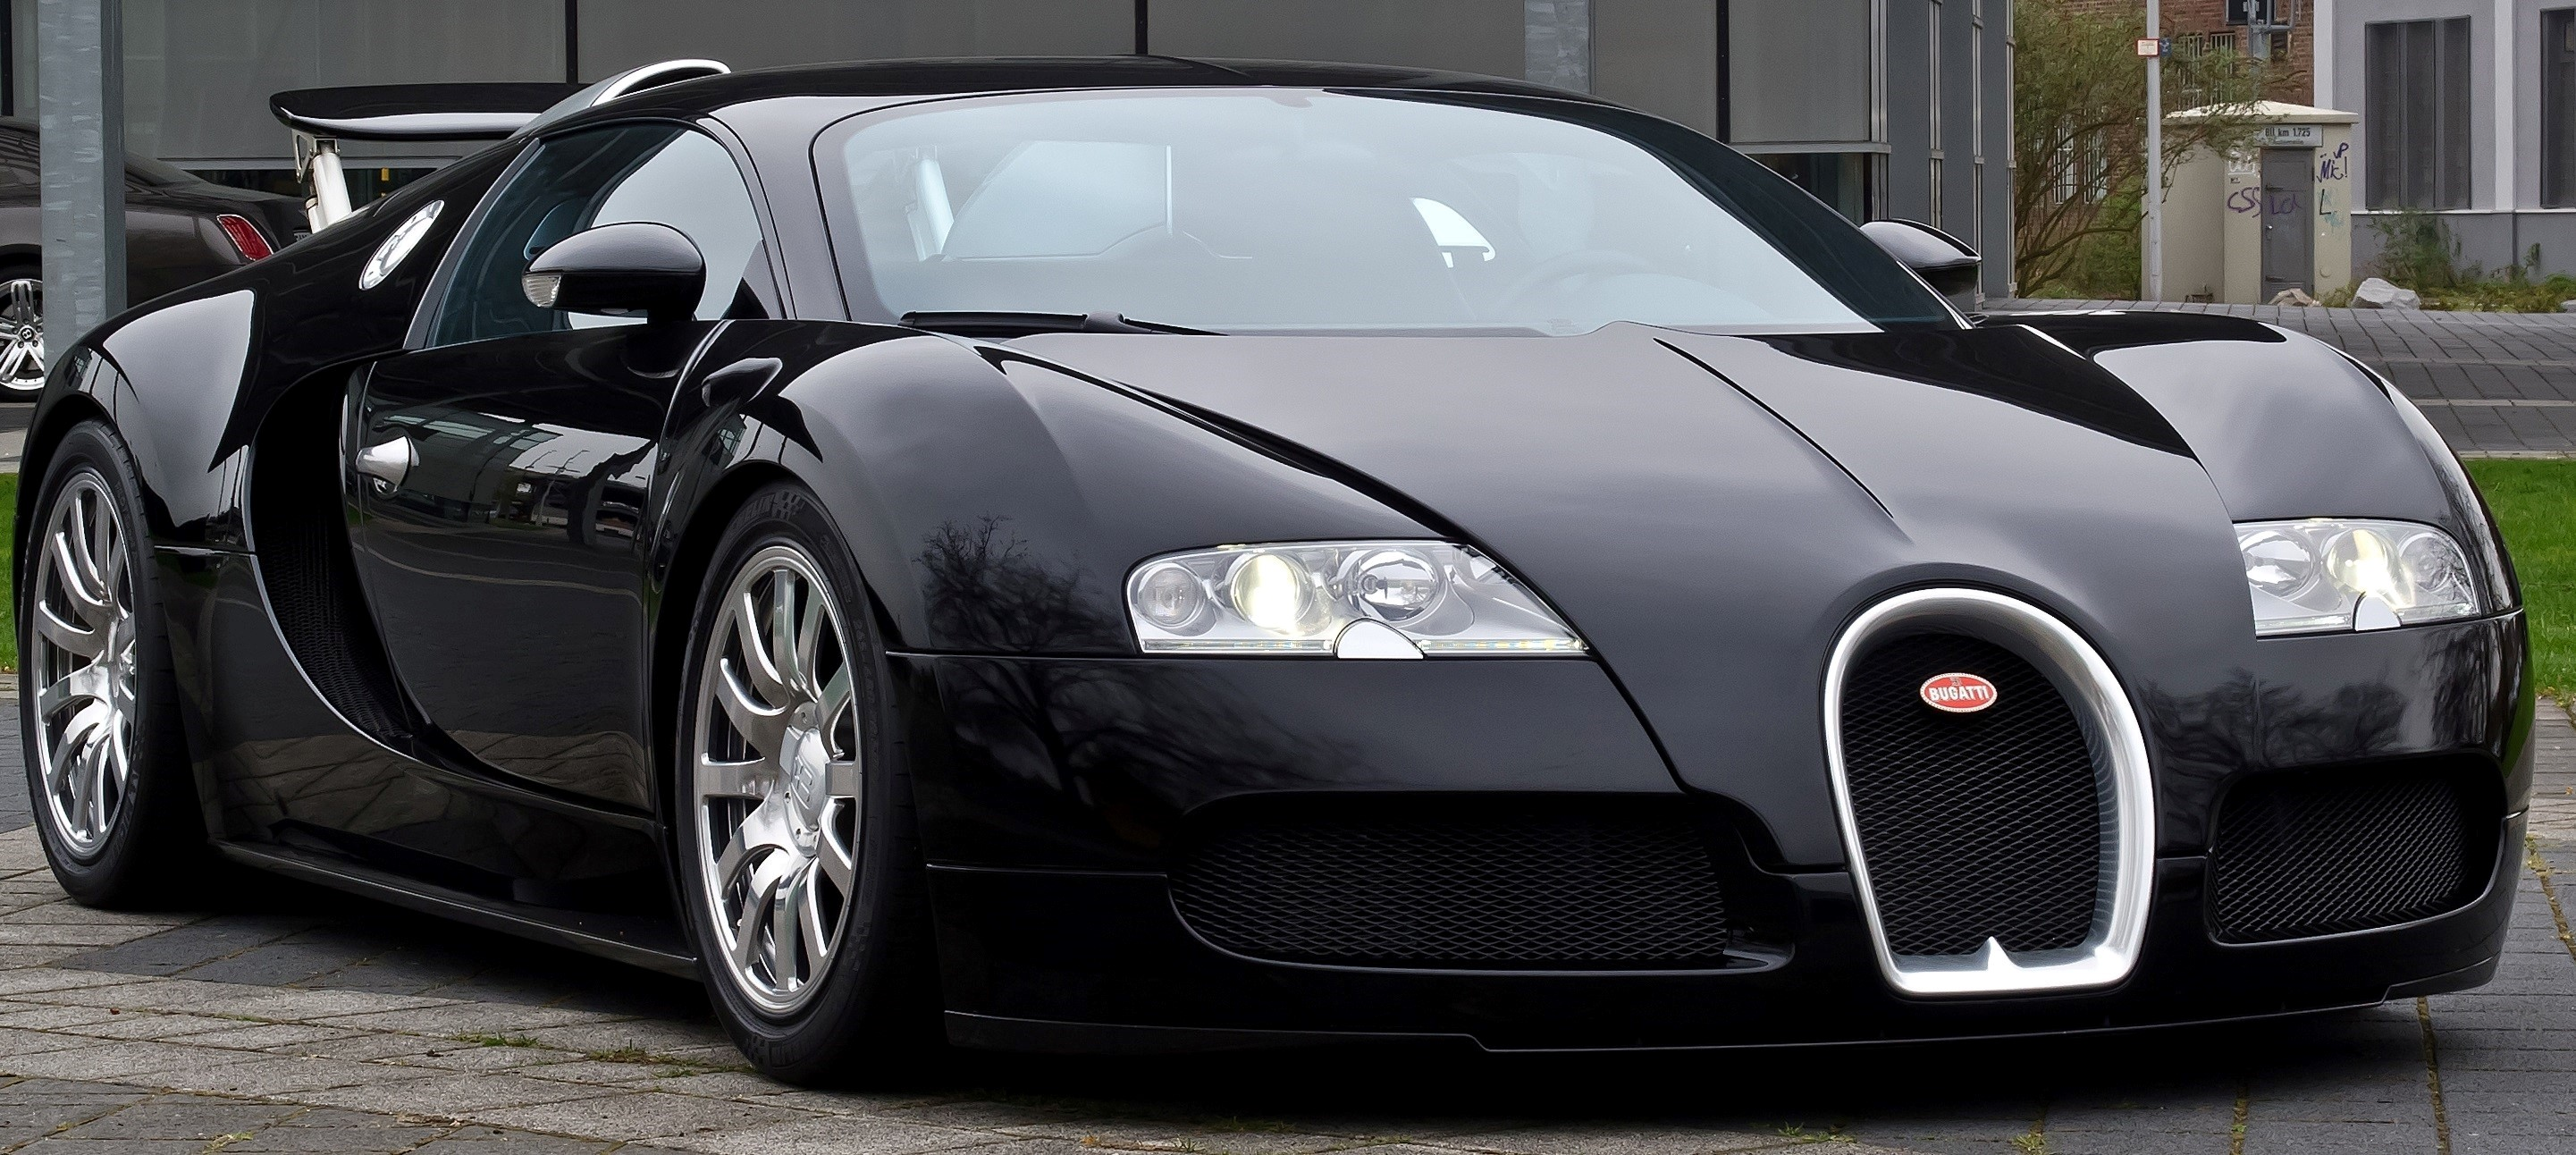 new black bugatti veyron hd supperb cars wallpaper hd wallpapers - Bugatti Veyron Wallpaper